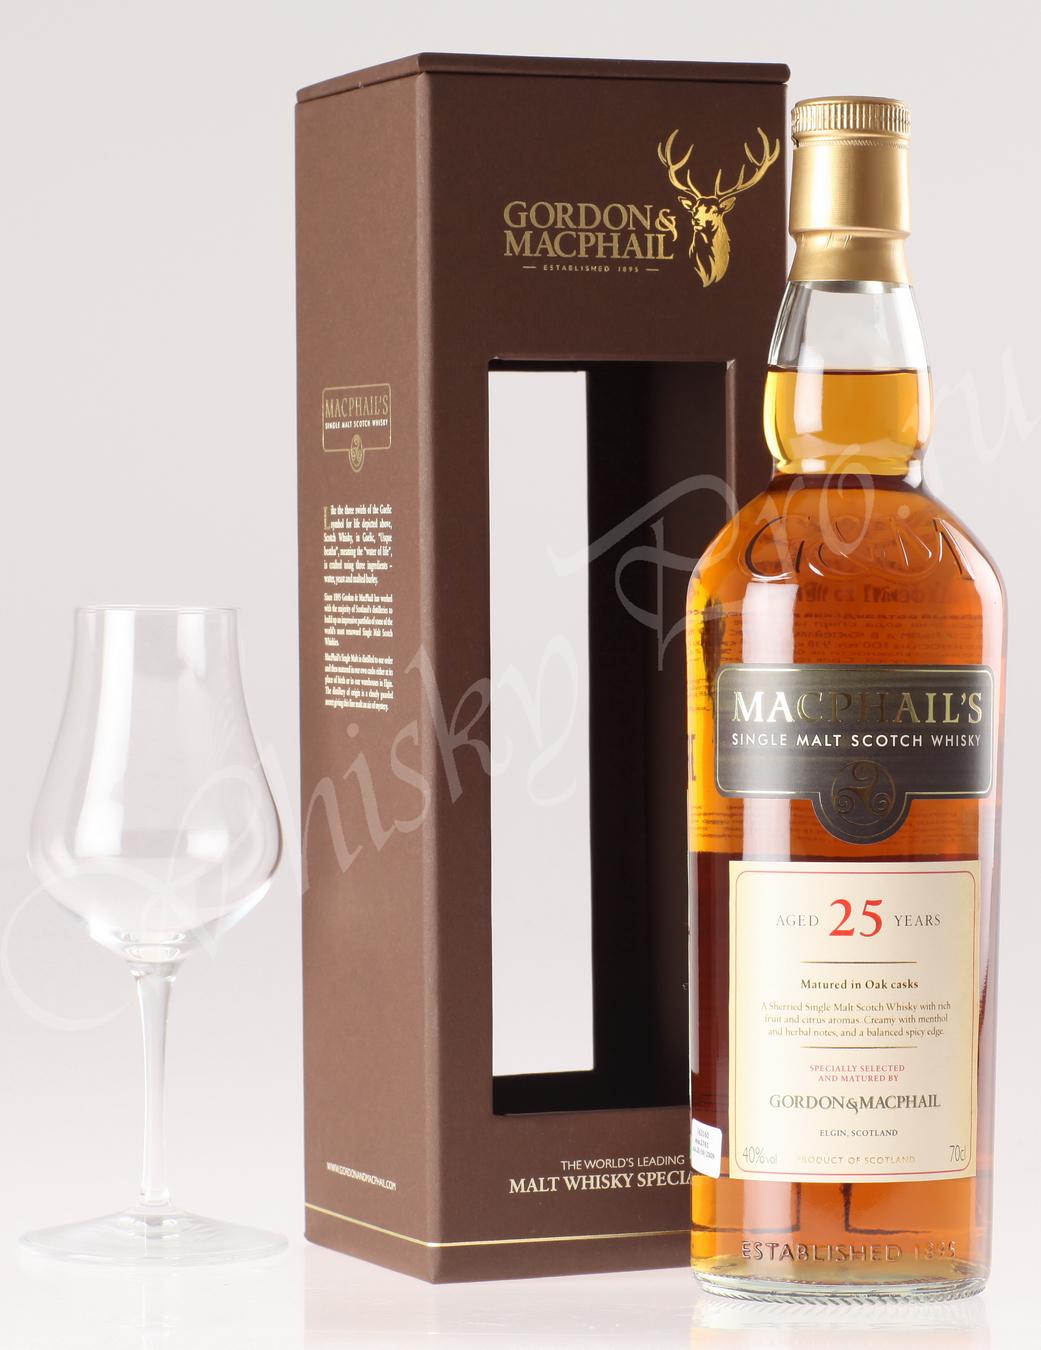 Виски Macphails 25 years виски Макфейлс 25 лет